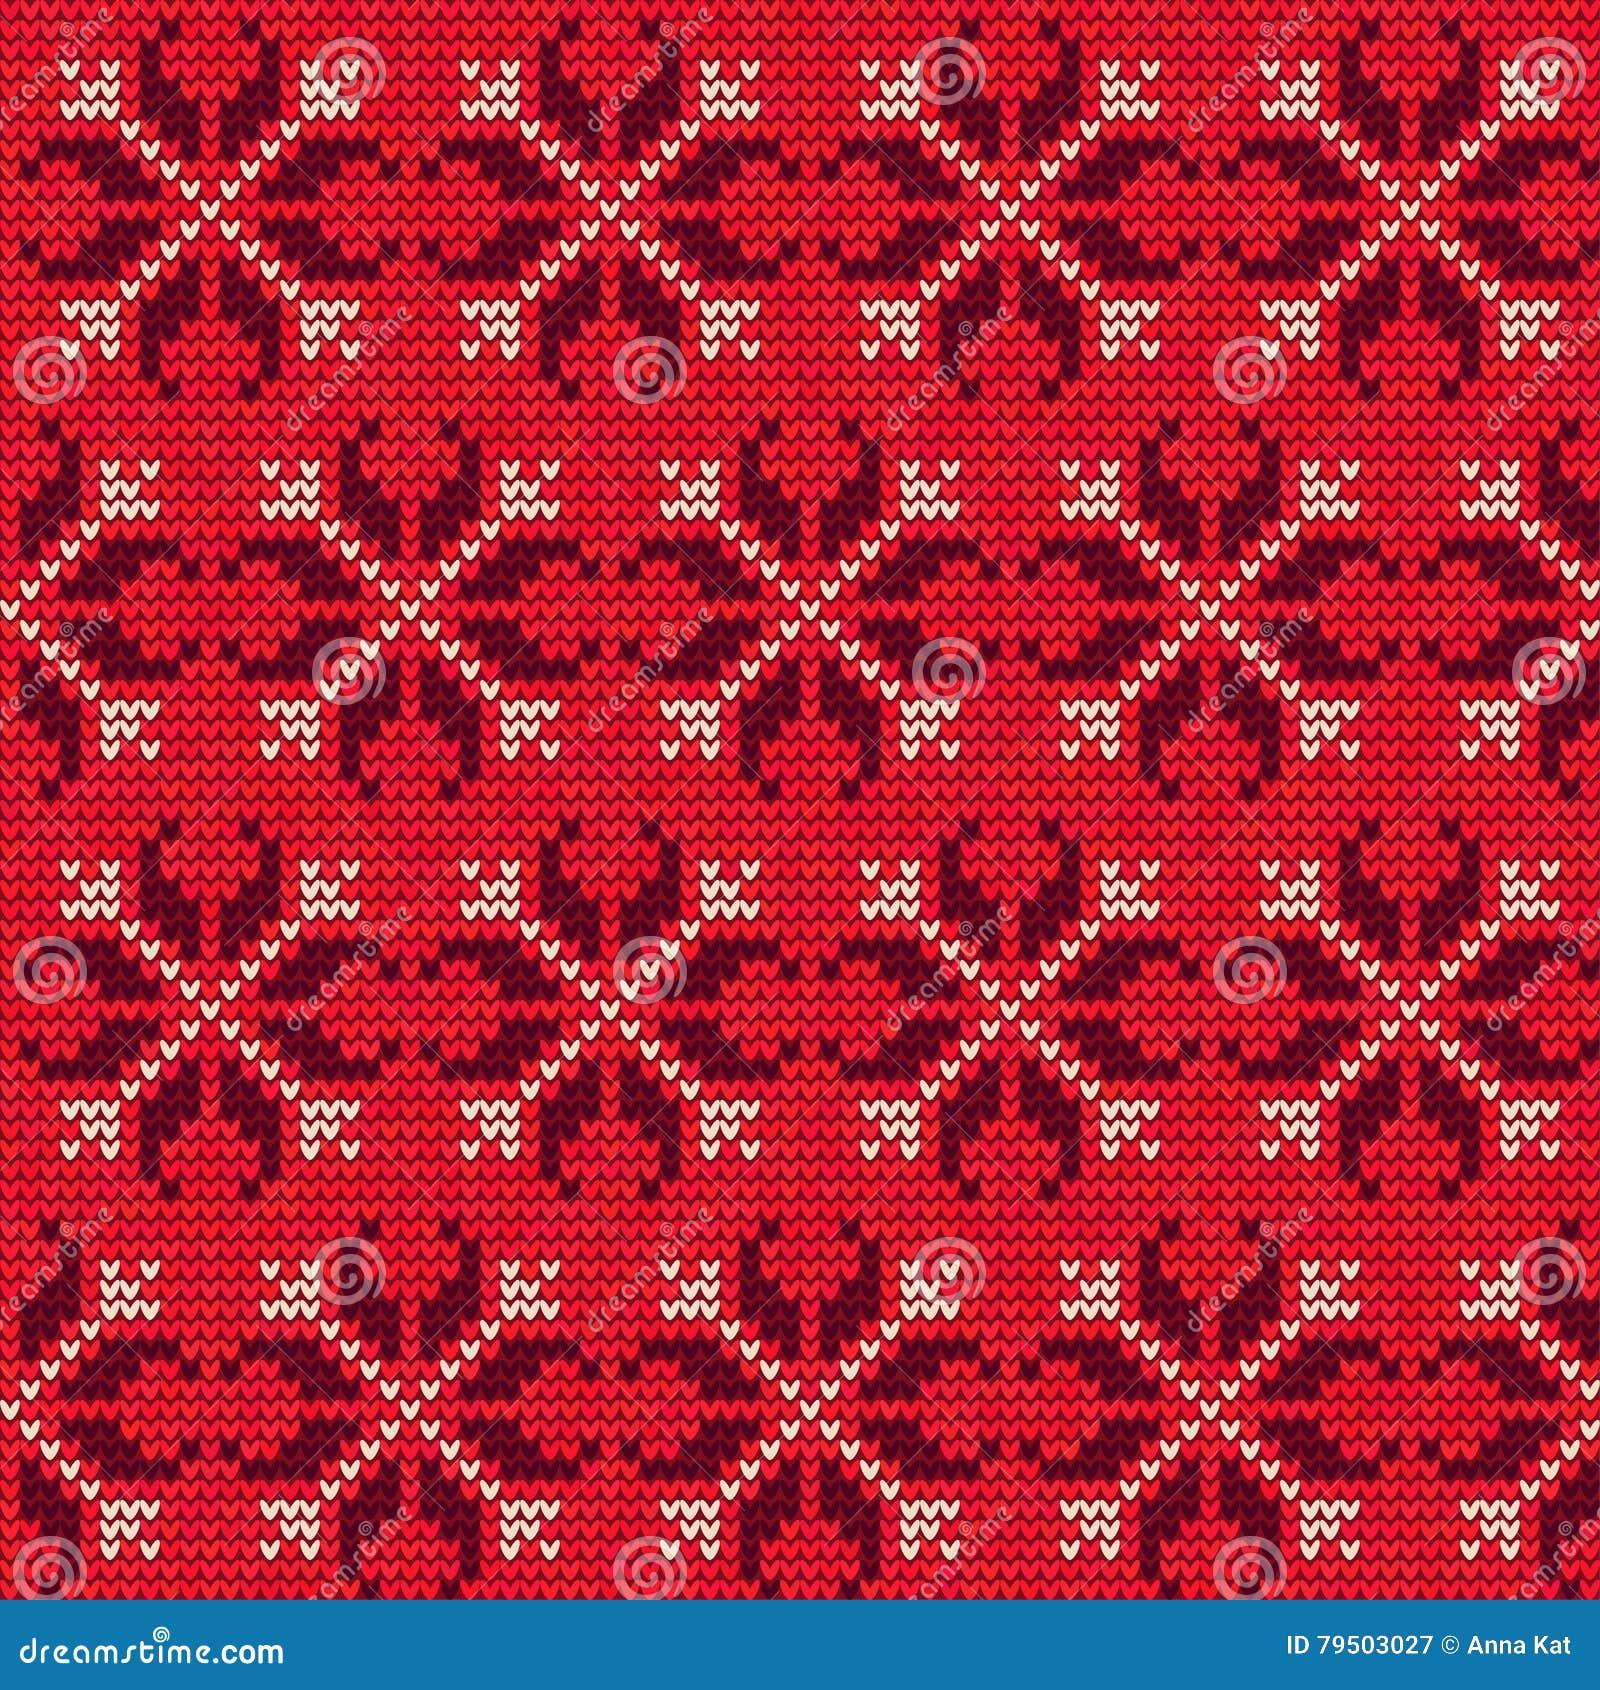 e5b60d4749337 Christmas Sweater Pattern9 stock vector. Illustration of fair - 79503027